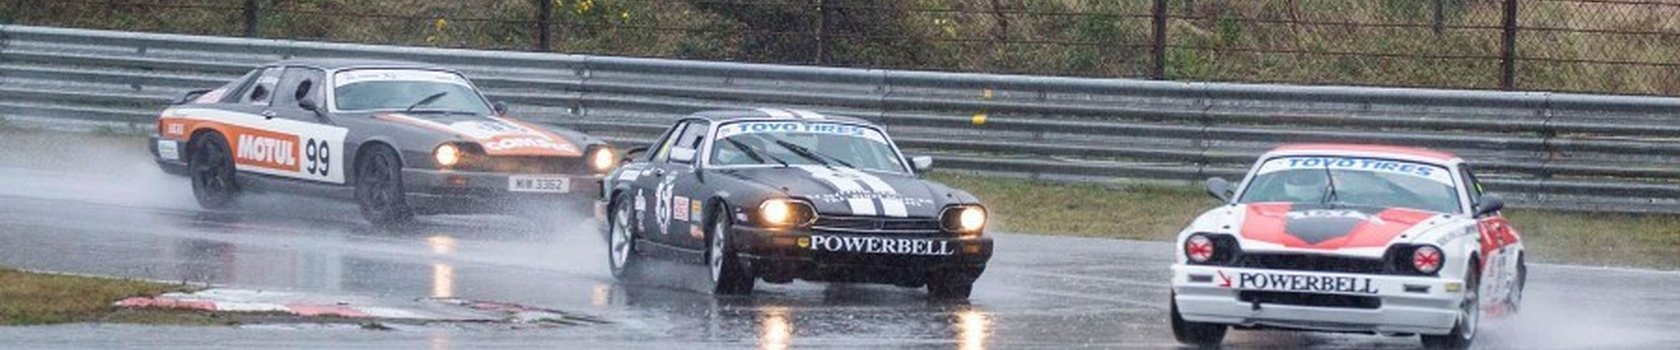 Xjs Racing1